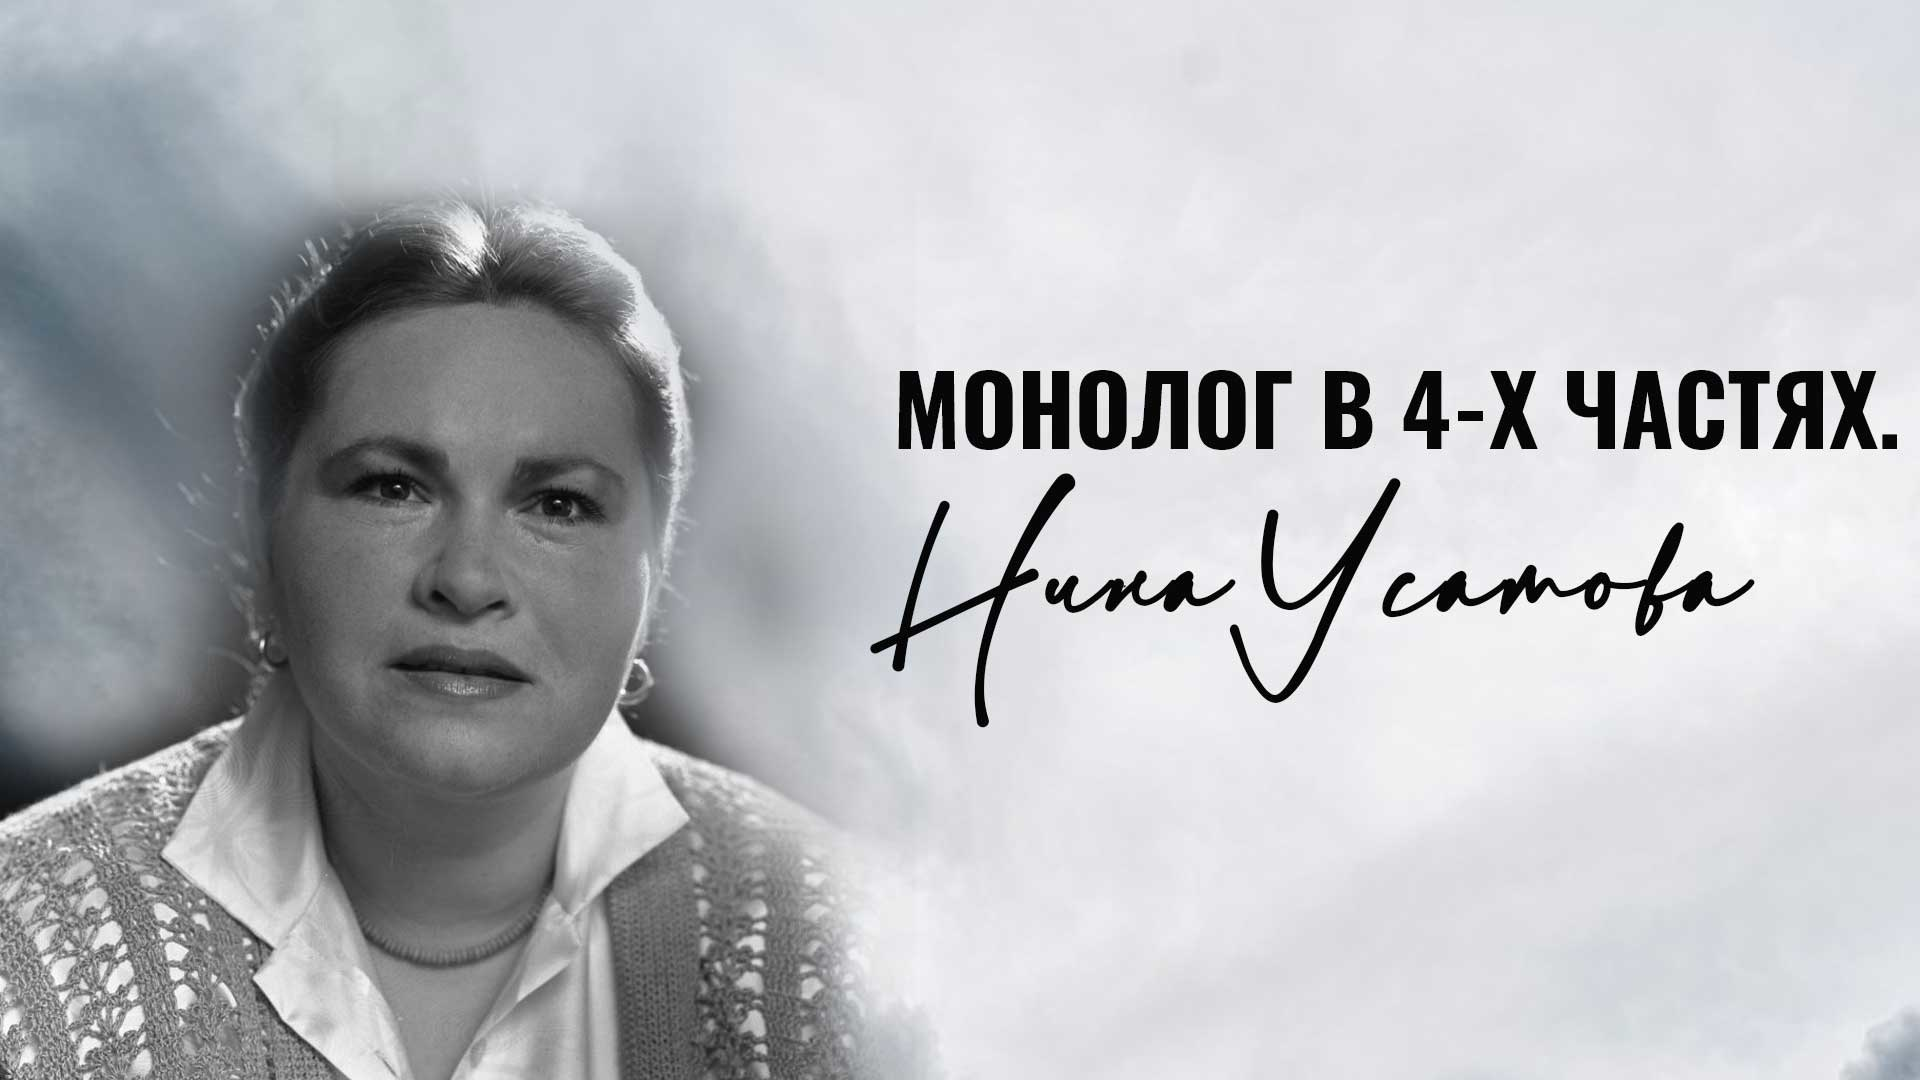 Монолог в 4-х частях. Нина Усатова